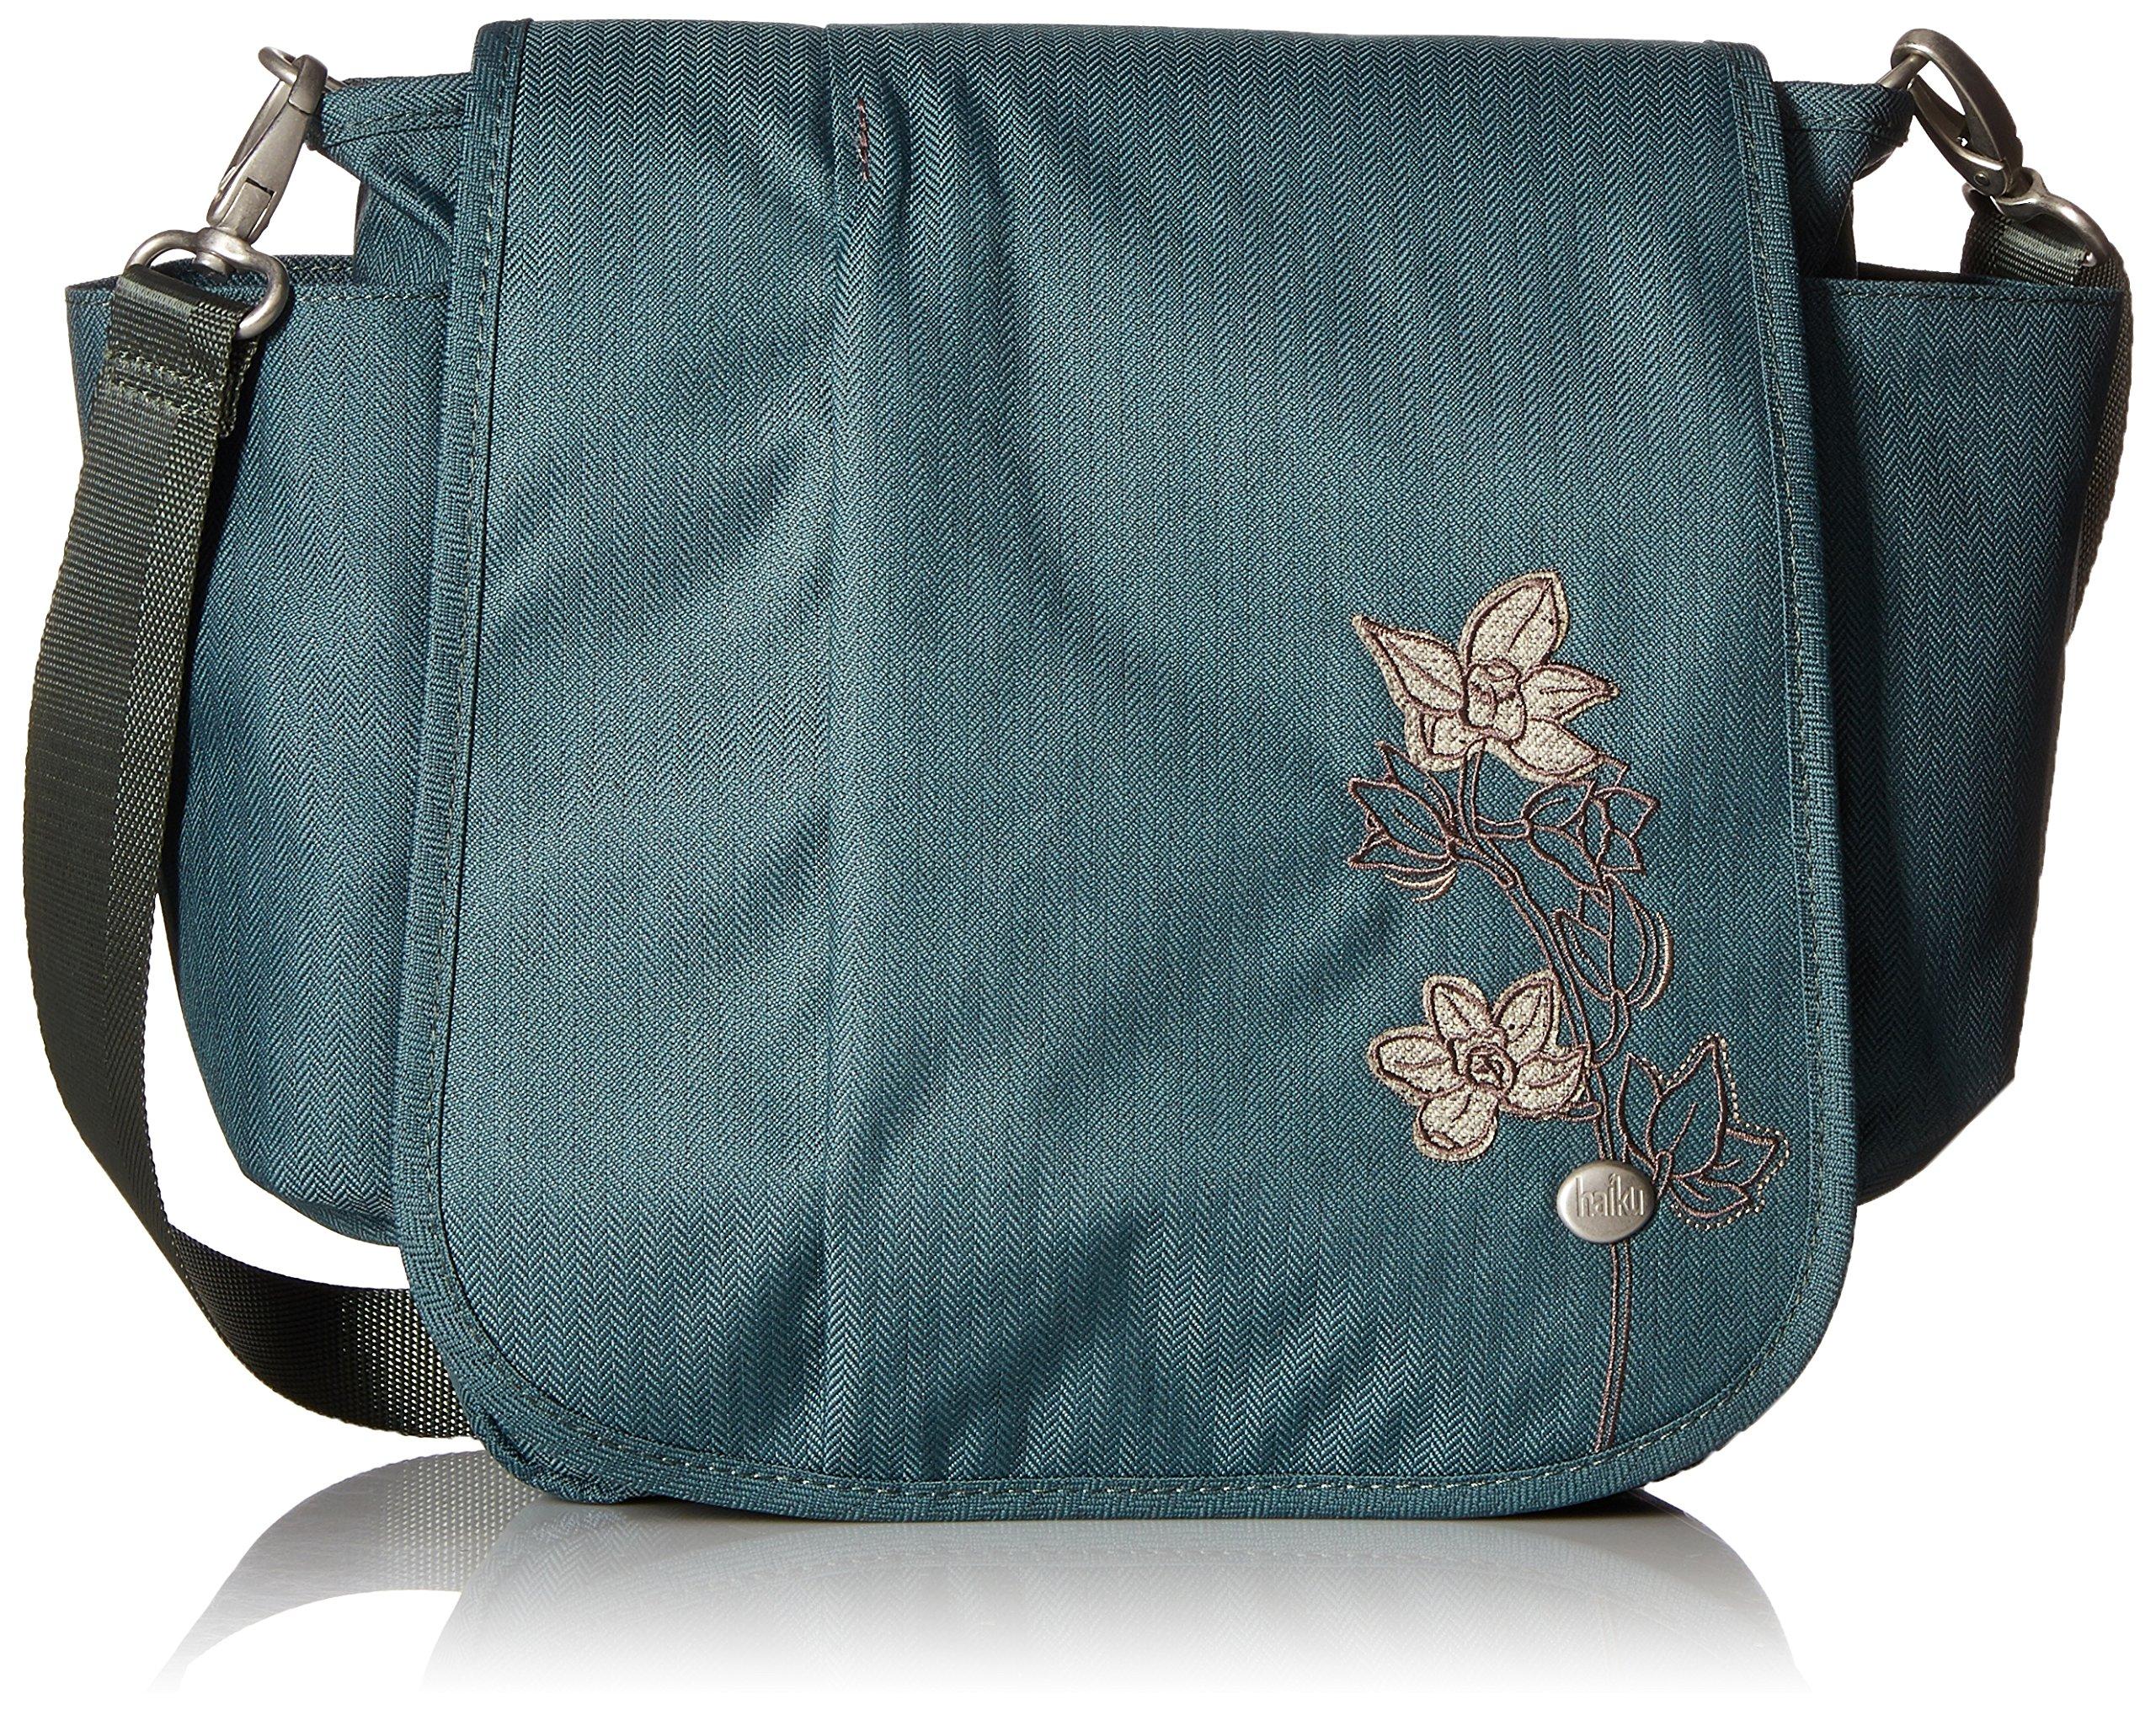 Haiku Women's To Go Convertible Messenger Crossbody Handbag, Balsam Green